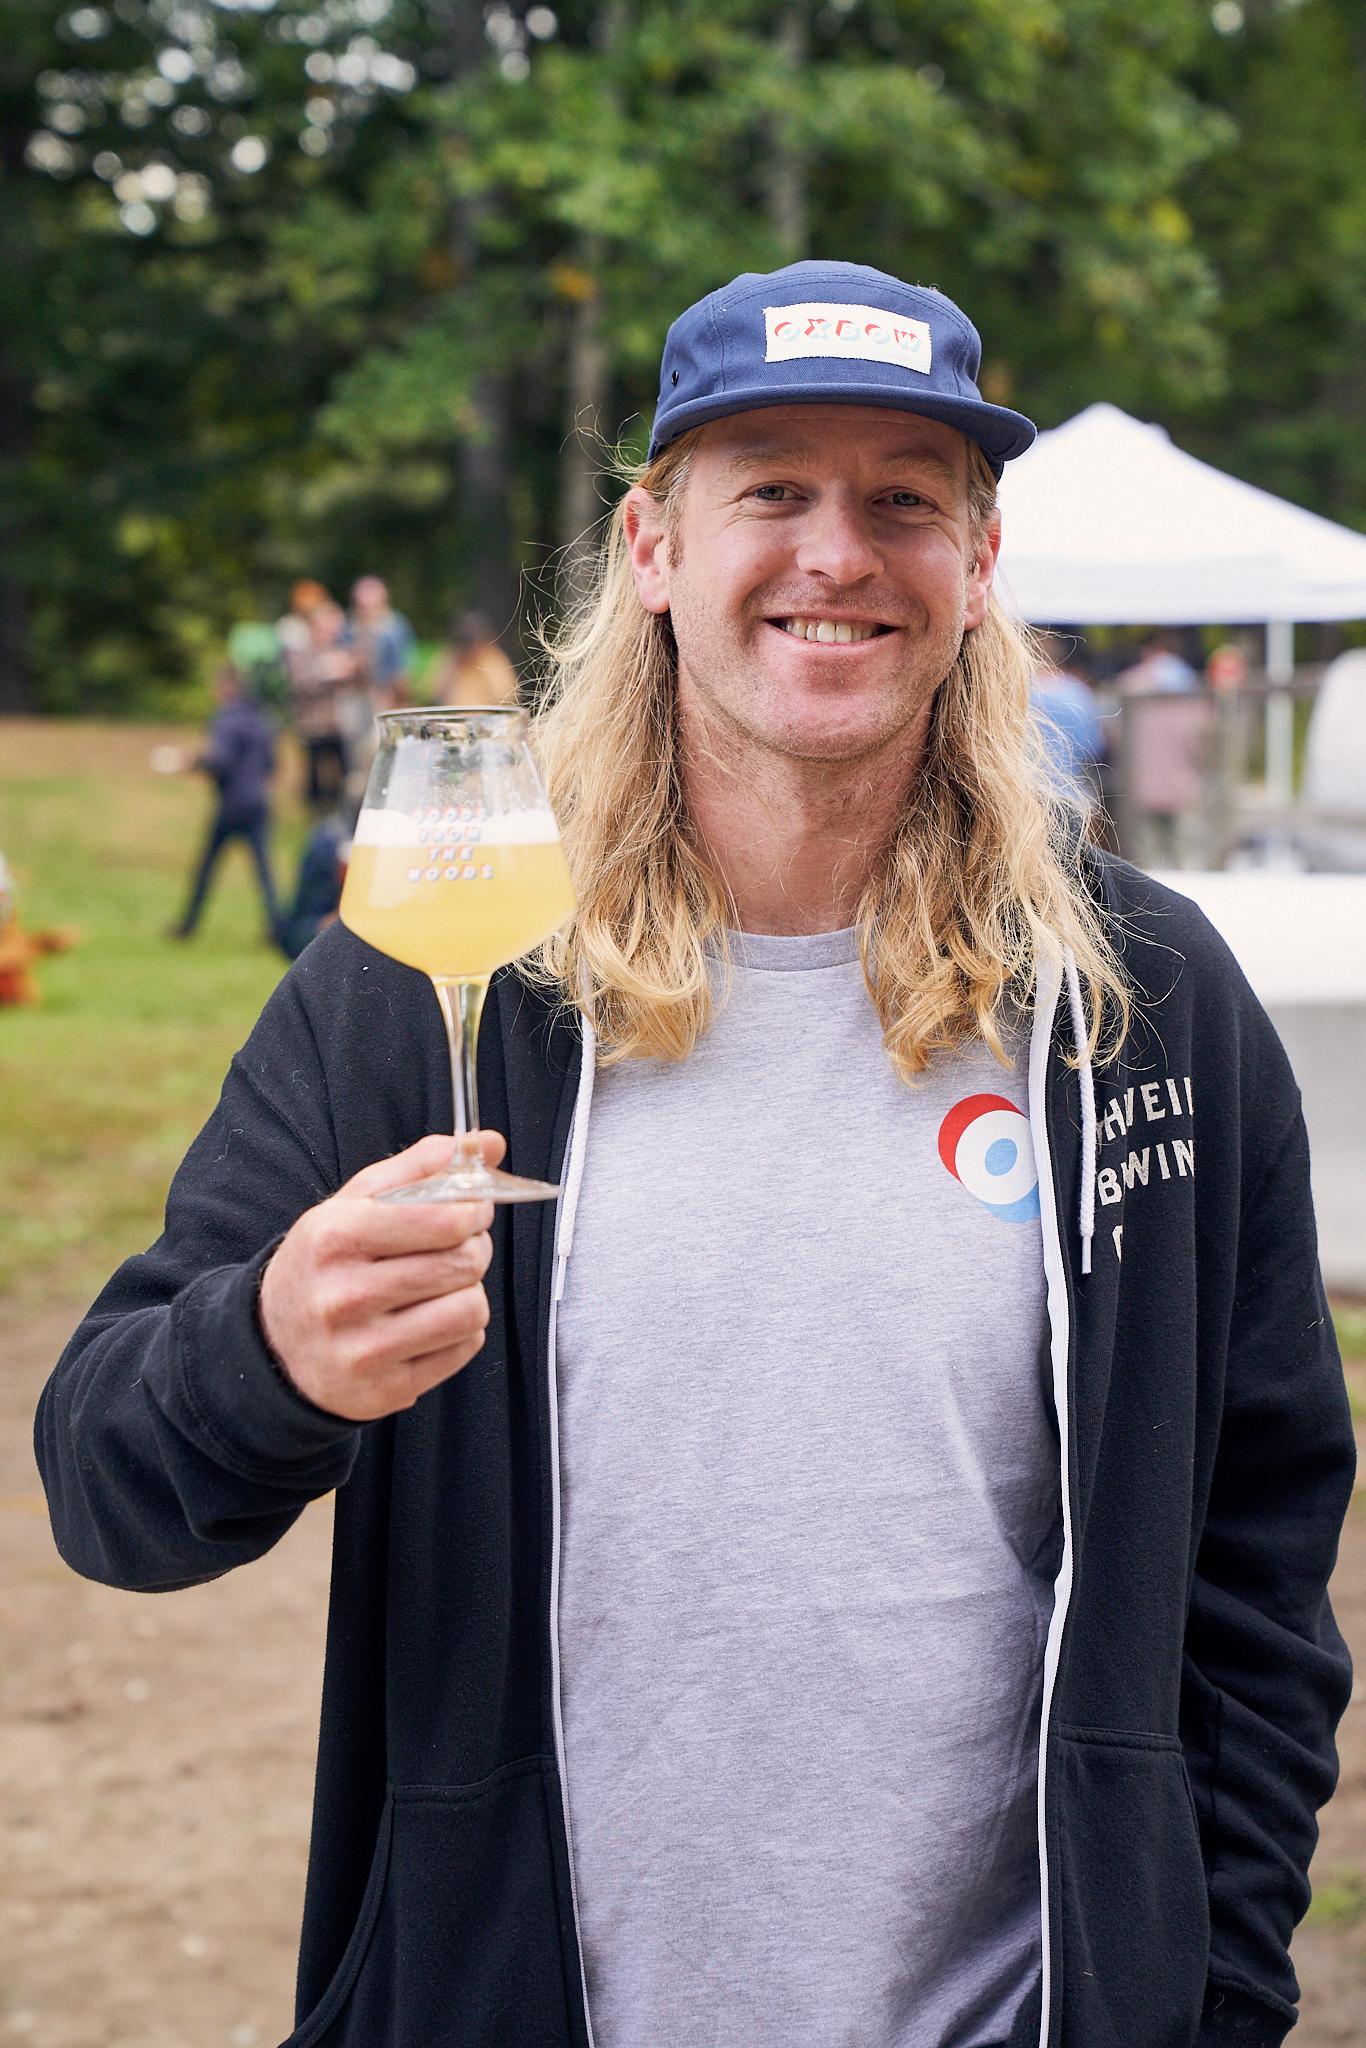 Oxbow Co-founder Tim Adams raises a glass.